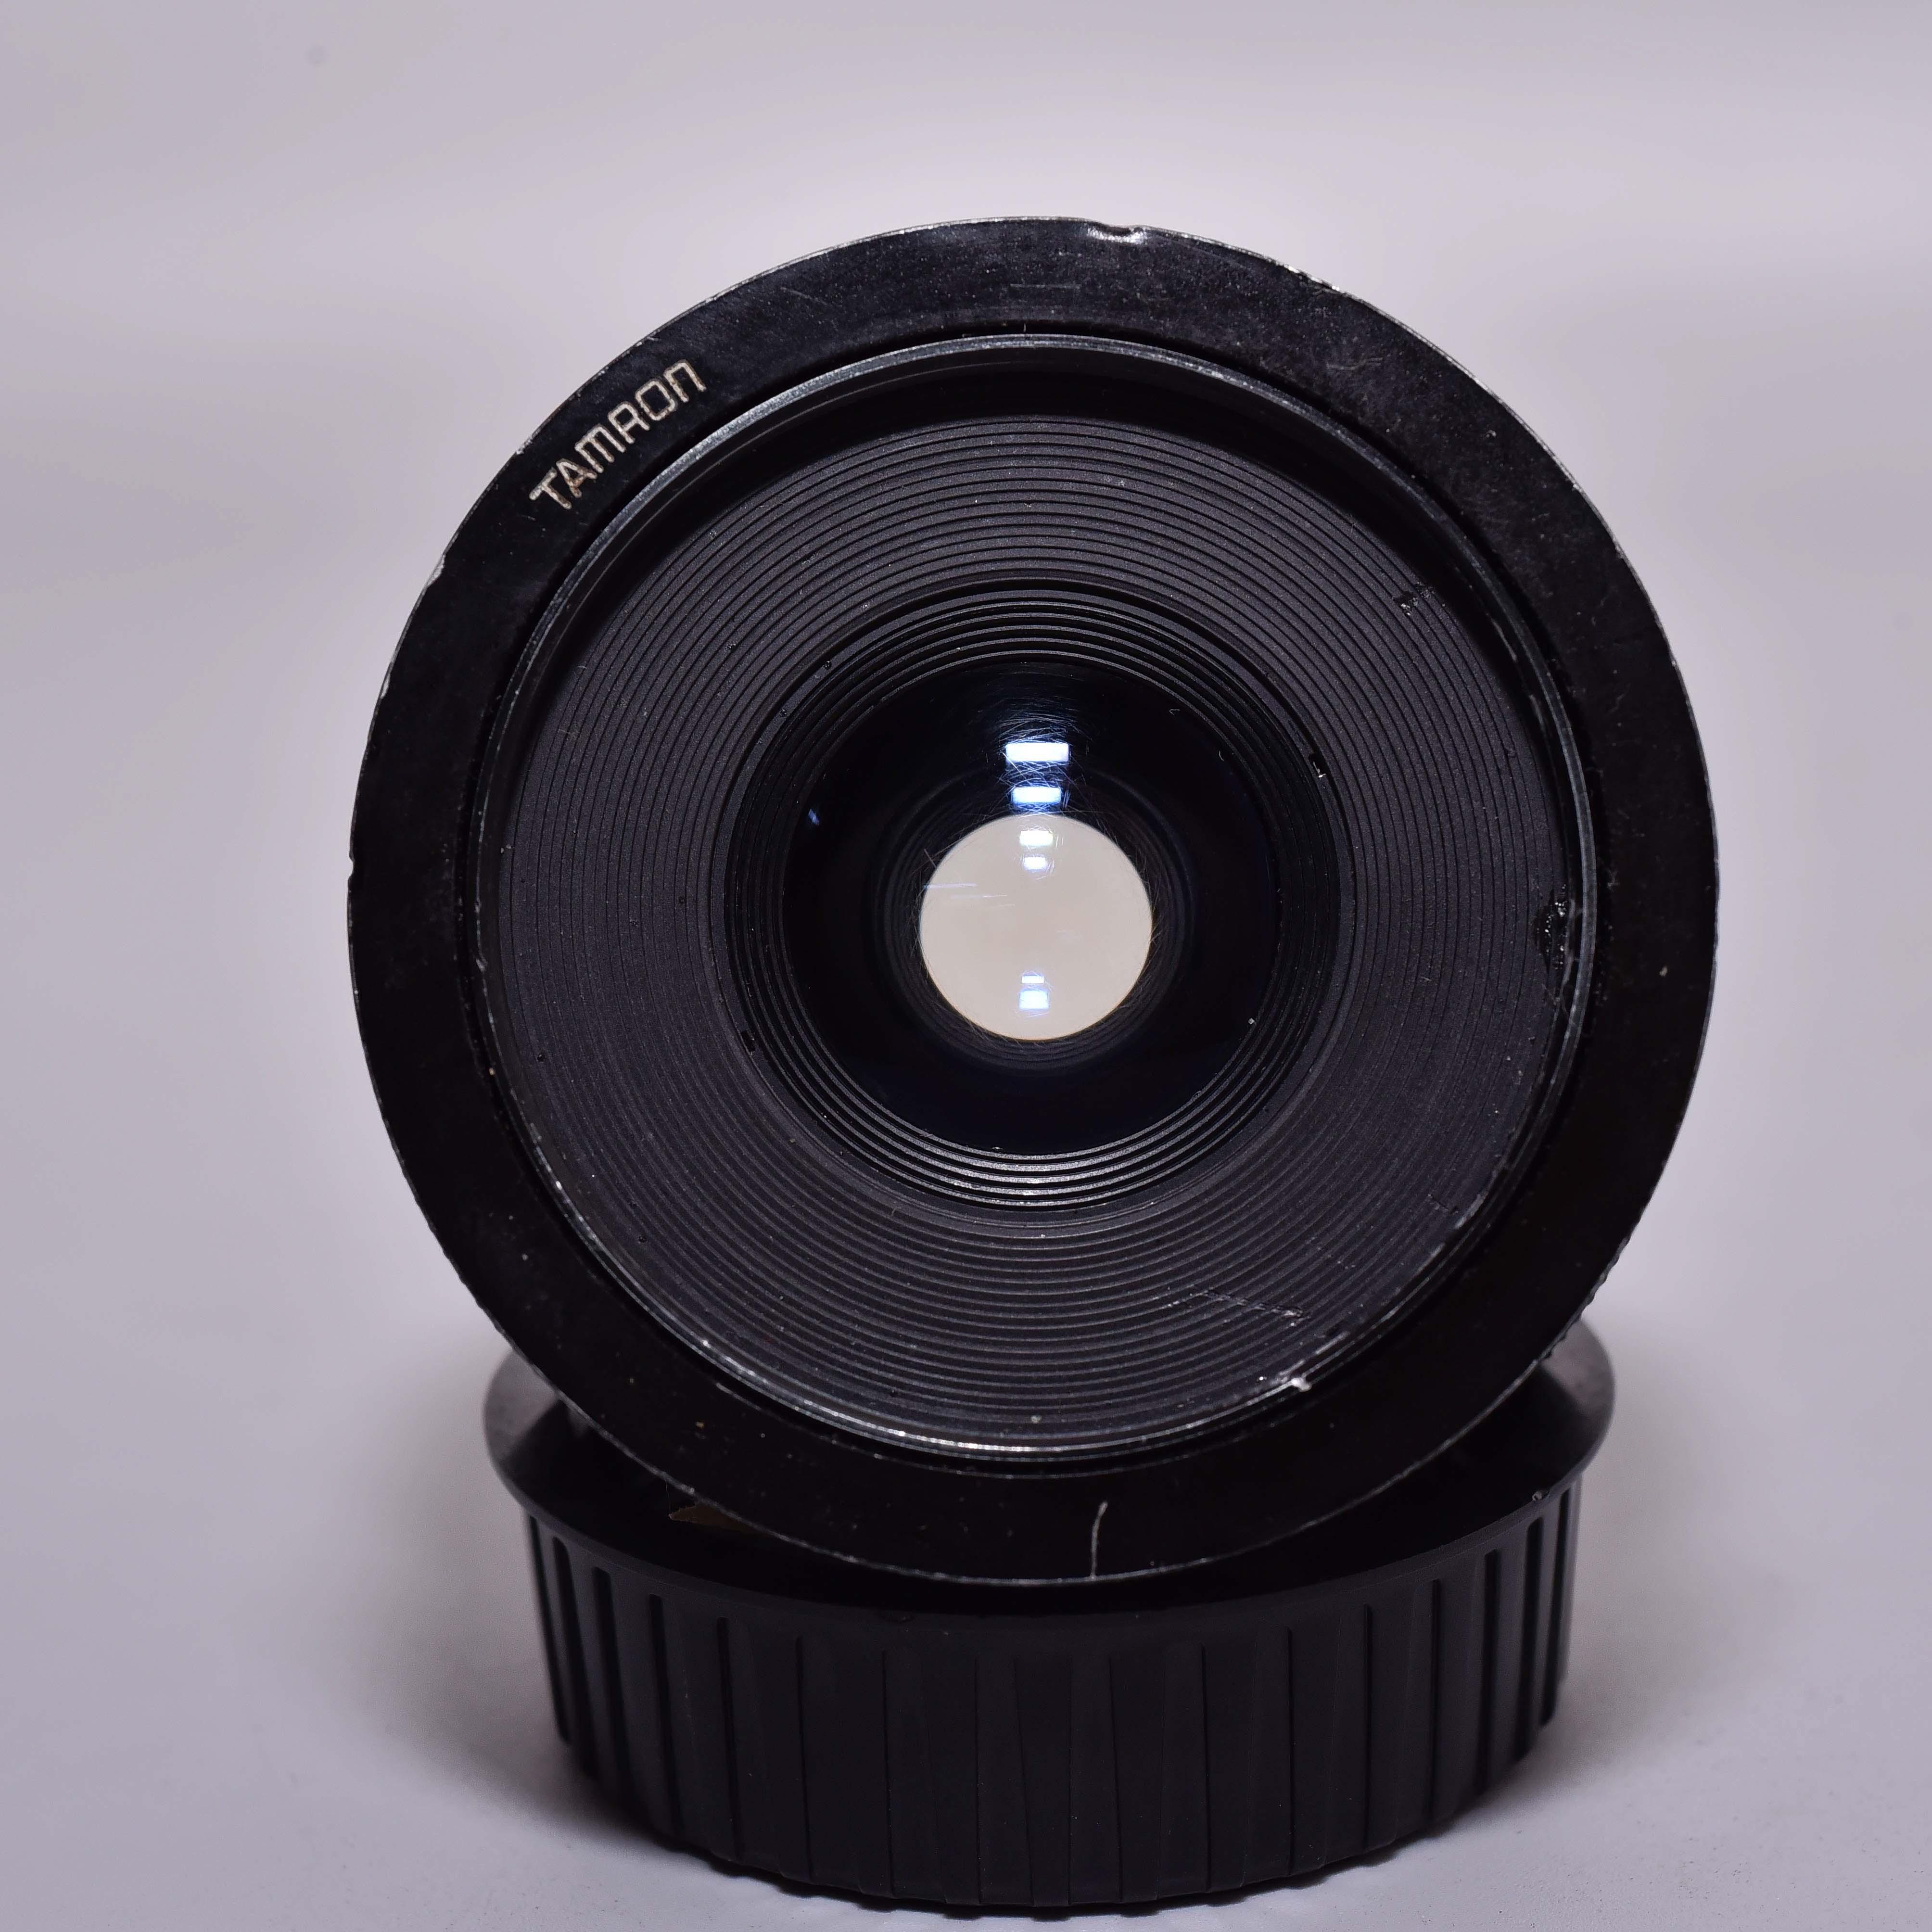 tamron-28mm-f2-5-adaptall-2-28-2-5-10075